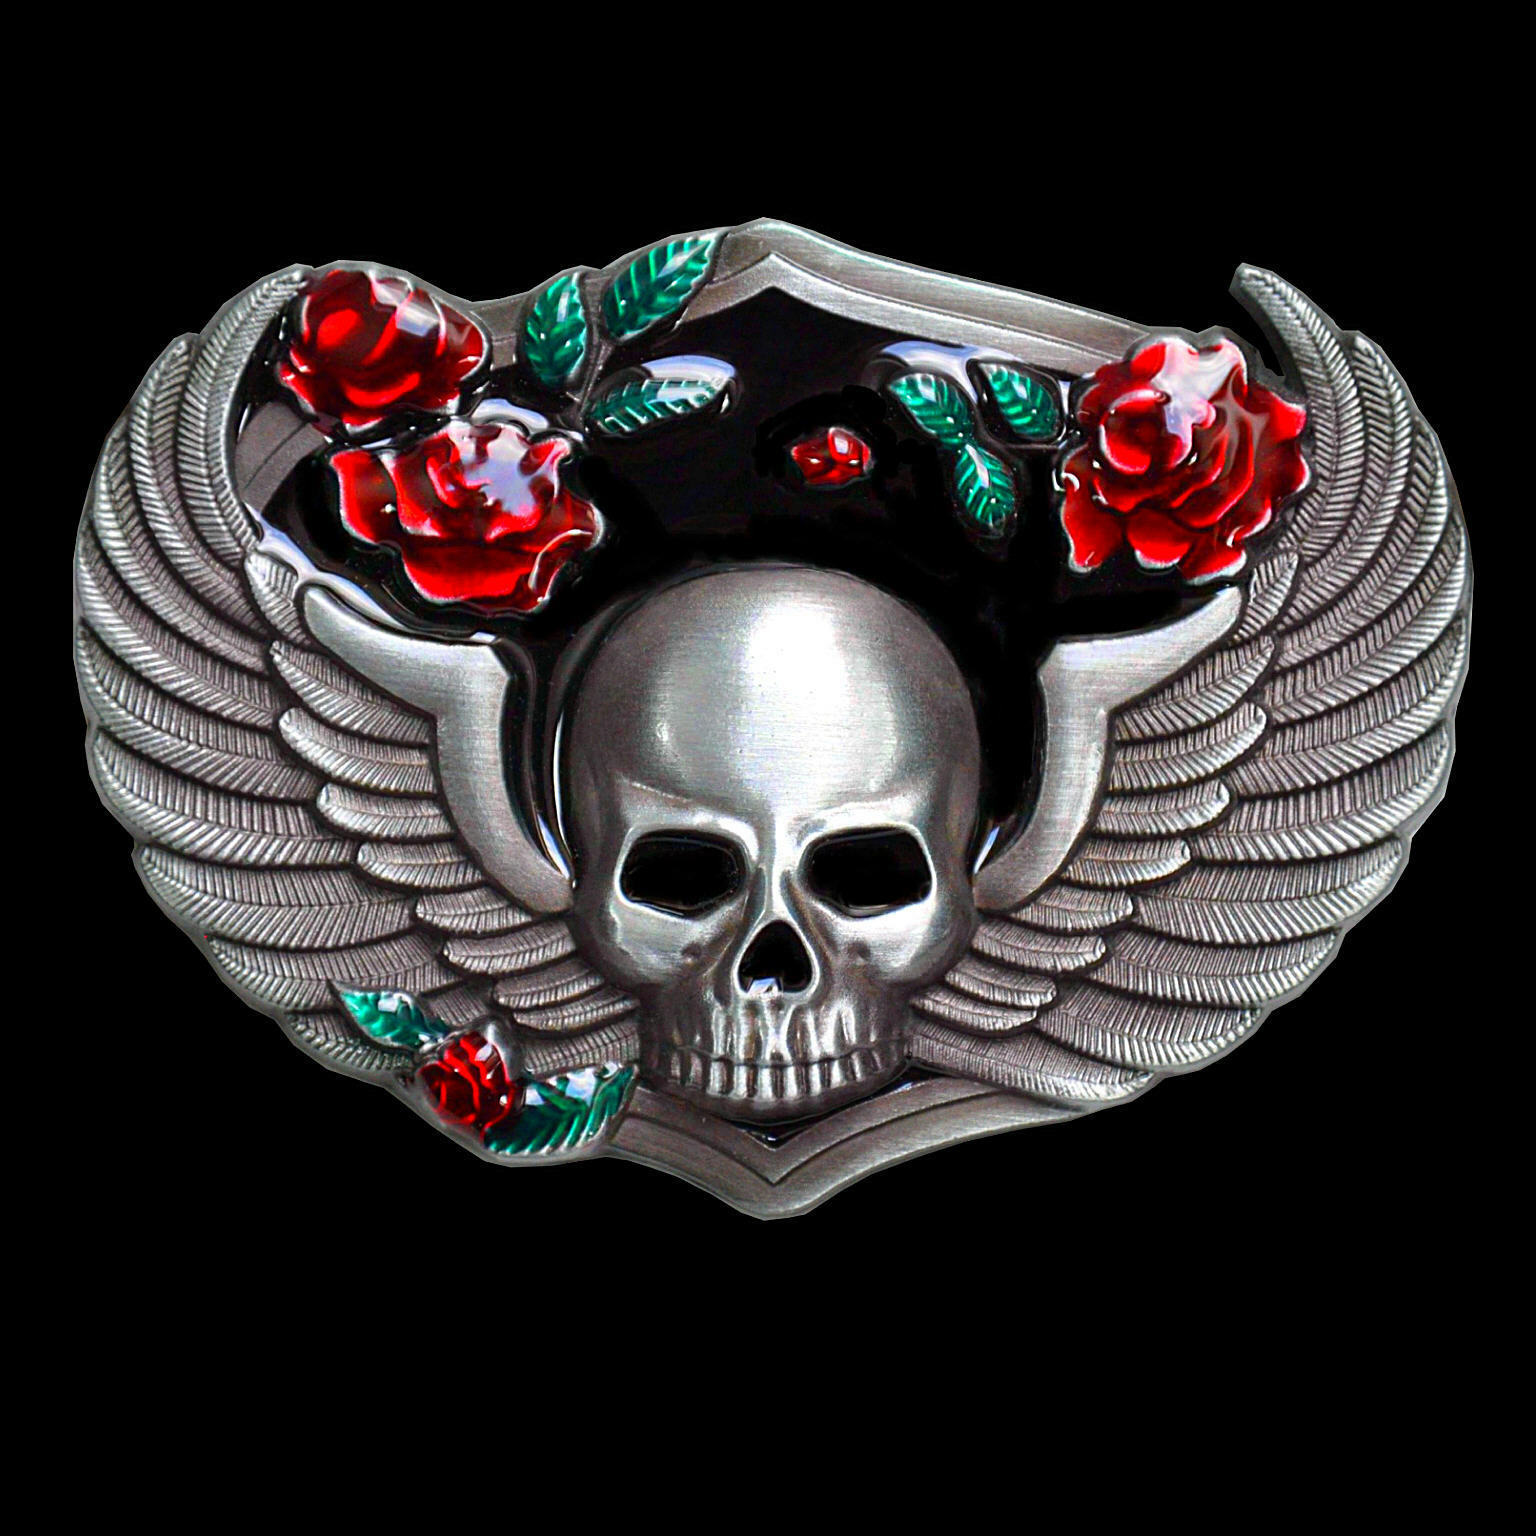 * Skull Gothic Totenkopf Rockabilly Biker Punk Gürtelschnalle Buckle Damen *304